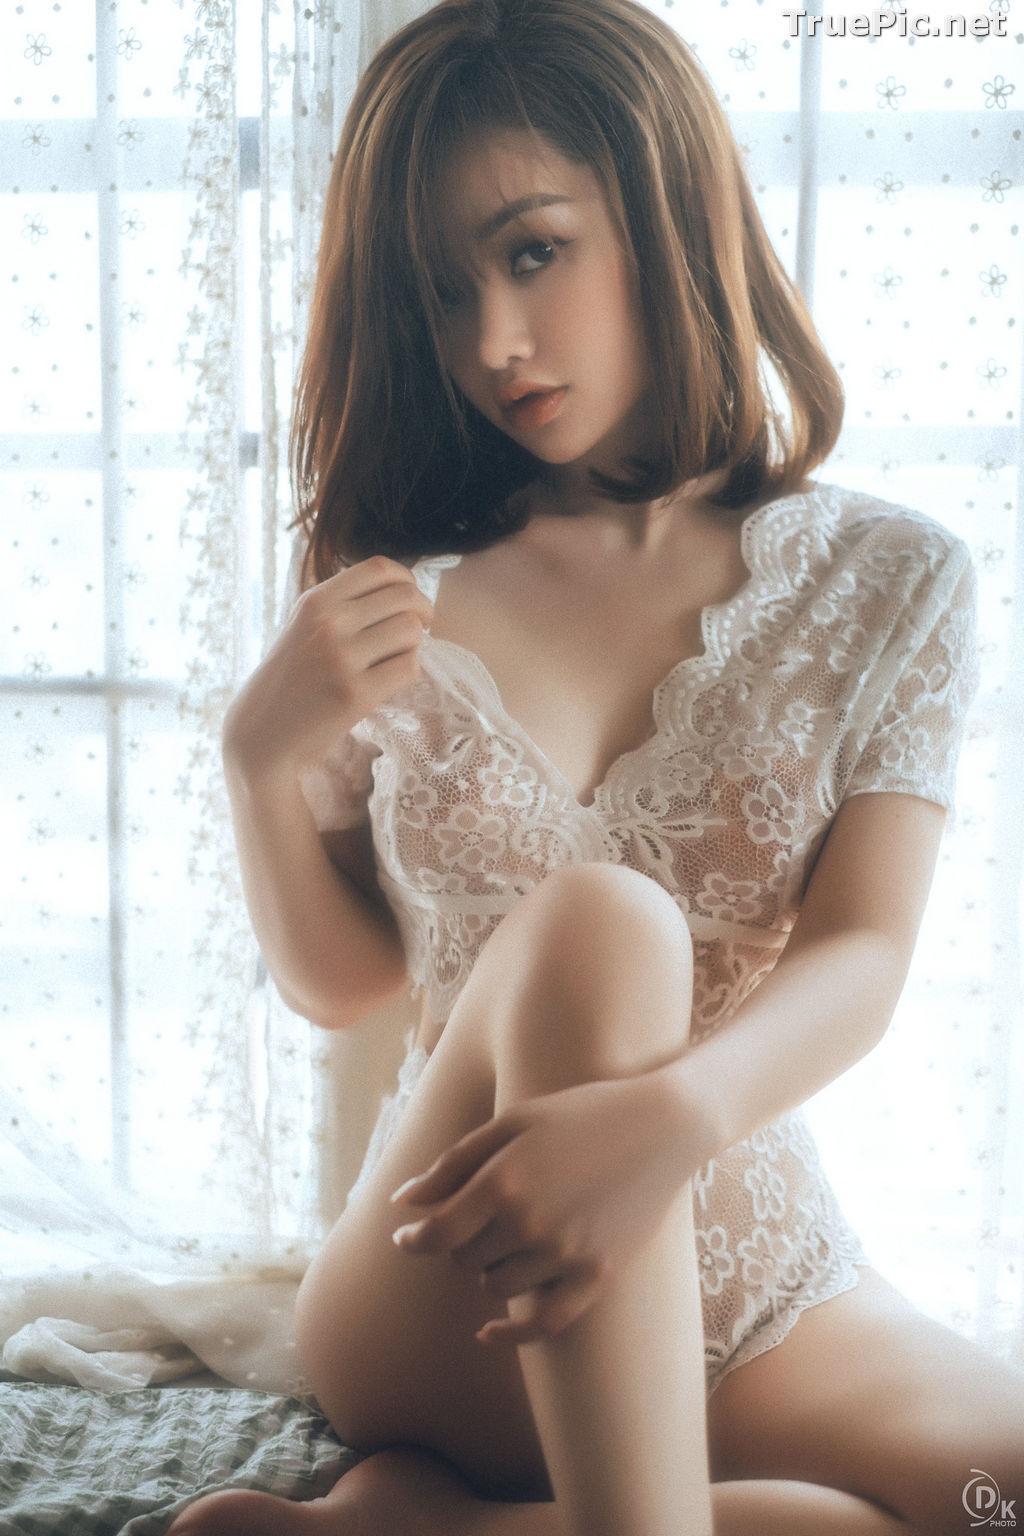 Image Vietnamese Hot Model - Sleepwear and Lingerie Under Dawnlight - TruePic.net - Picture-2